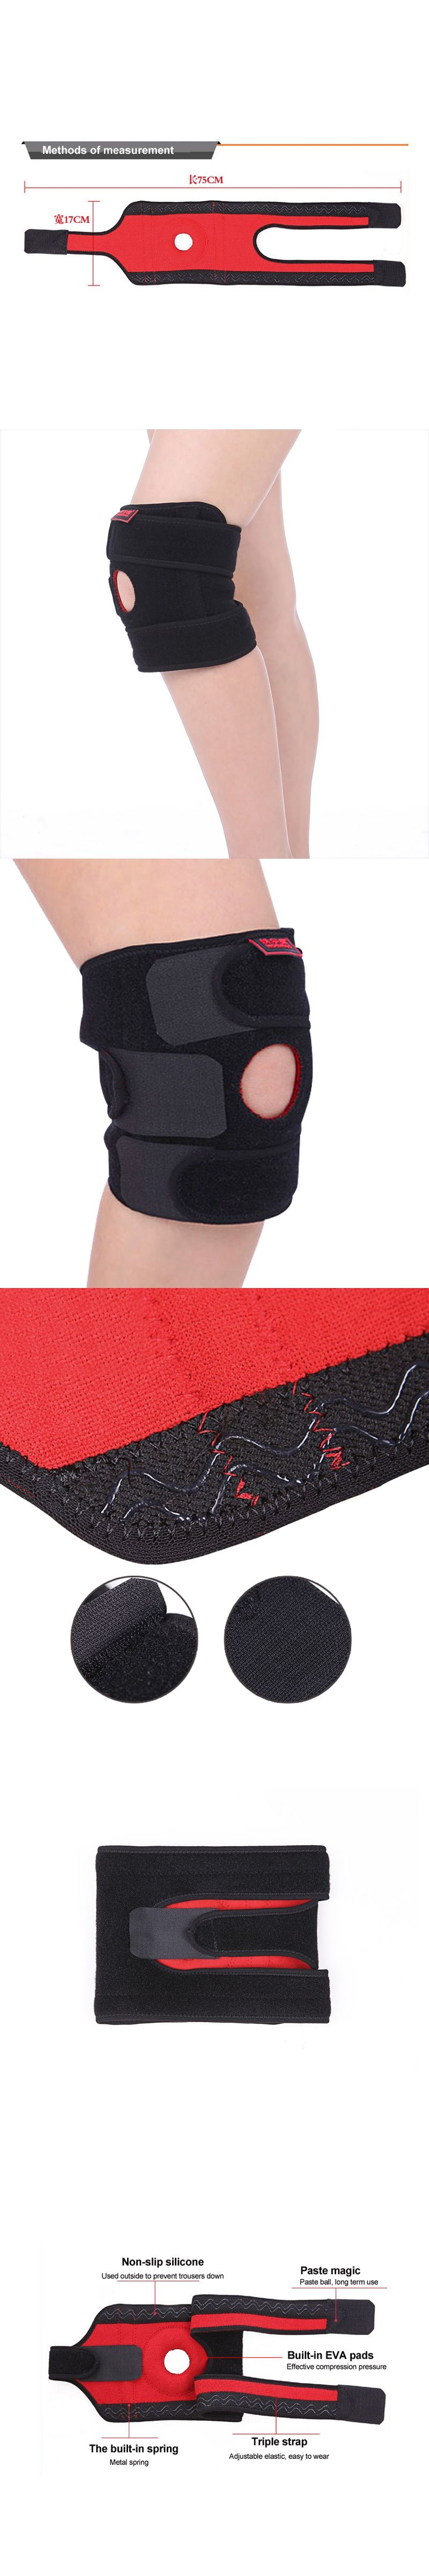 13c8a3d79e Adjustable Elastic Knee Support Brace Kneepads Patella Knee Hole Movement Kneepad  Safety Guard Running Basketball Knee